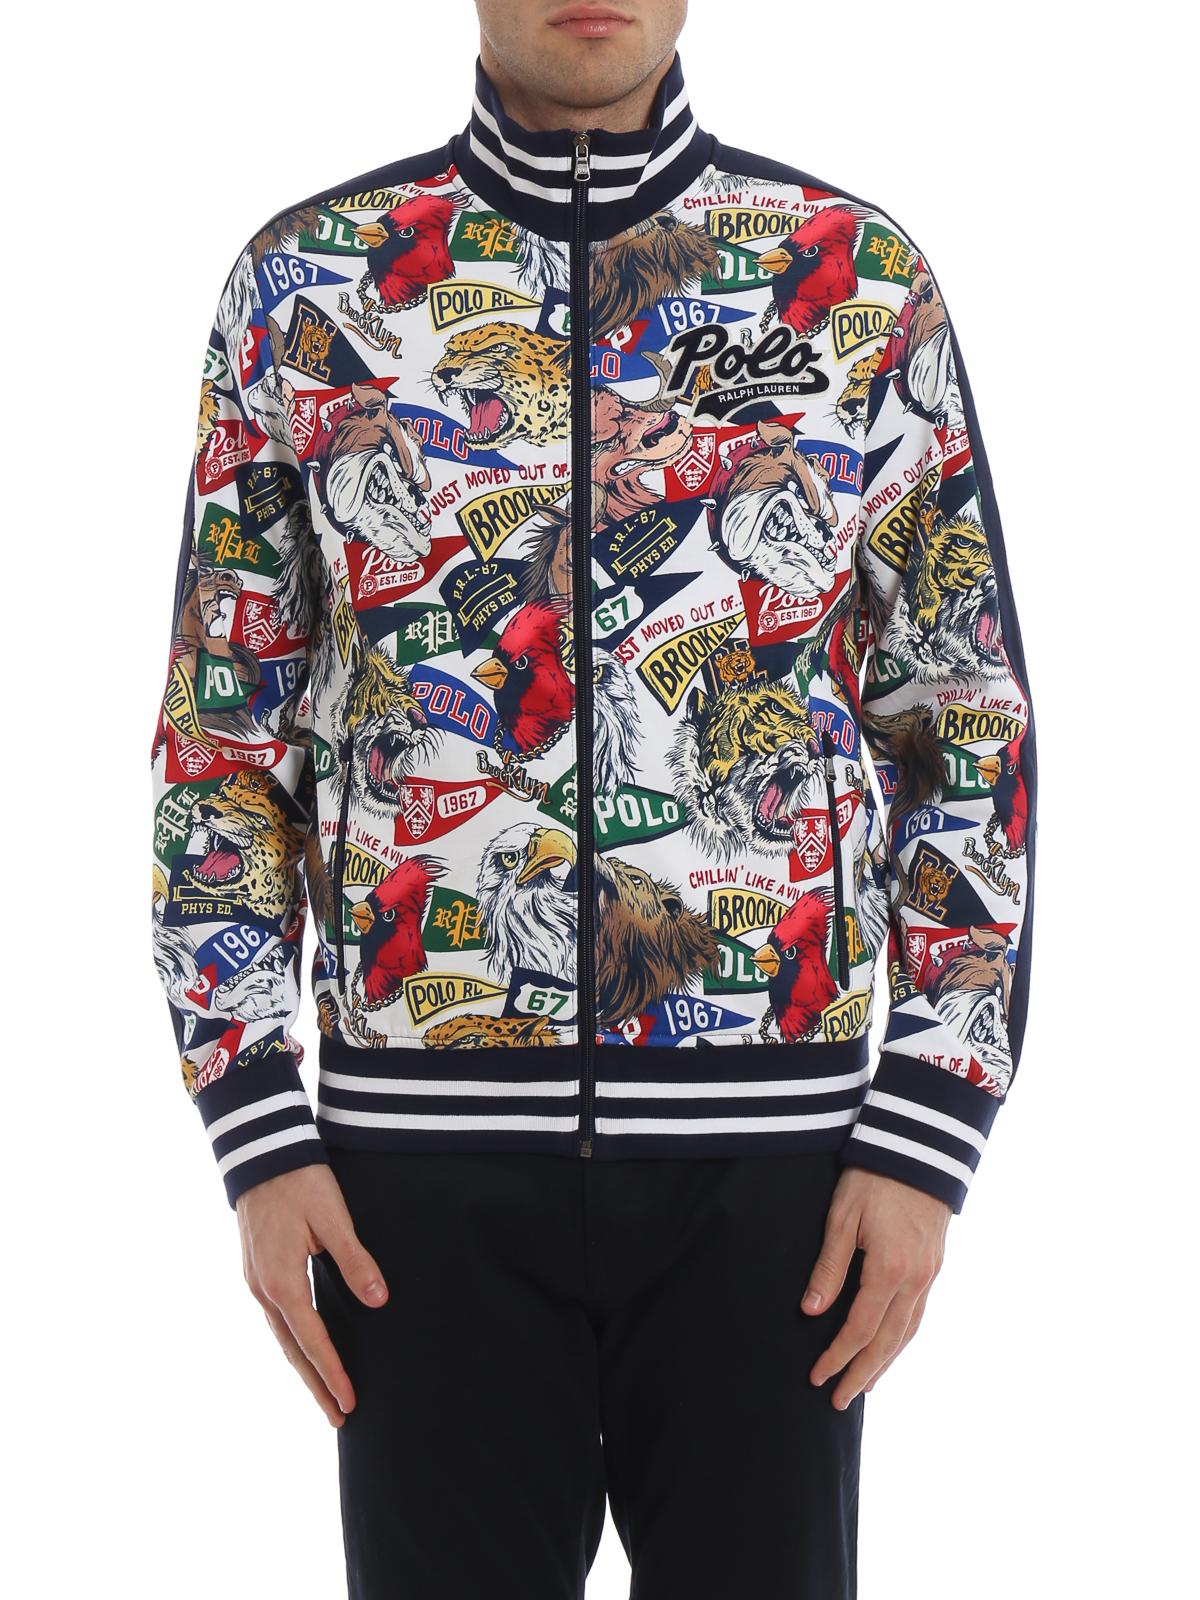 Polo Ralph Lauren - Graphic print varsity bomber jacket ...